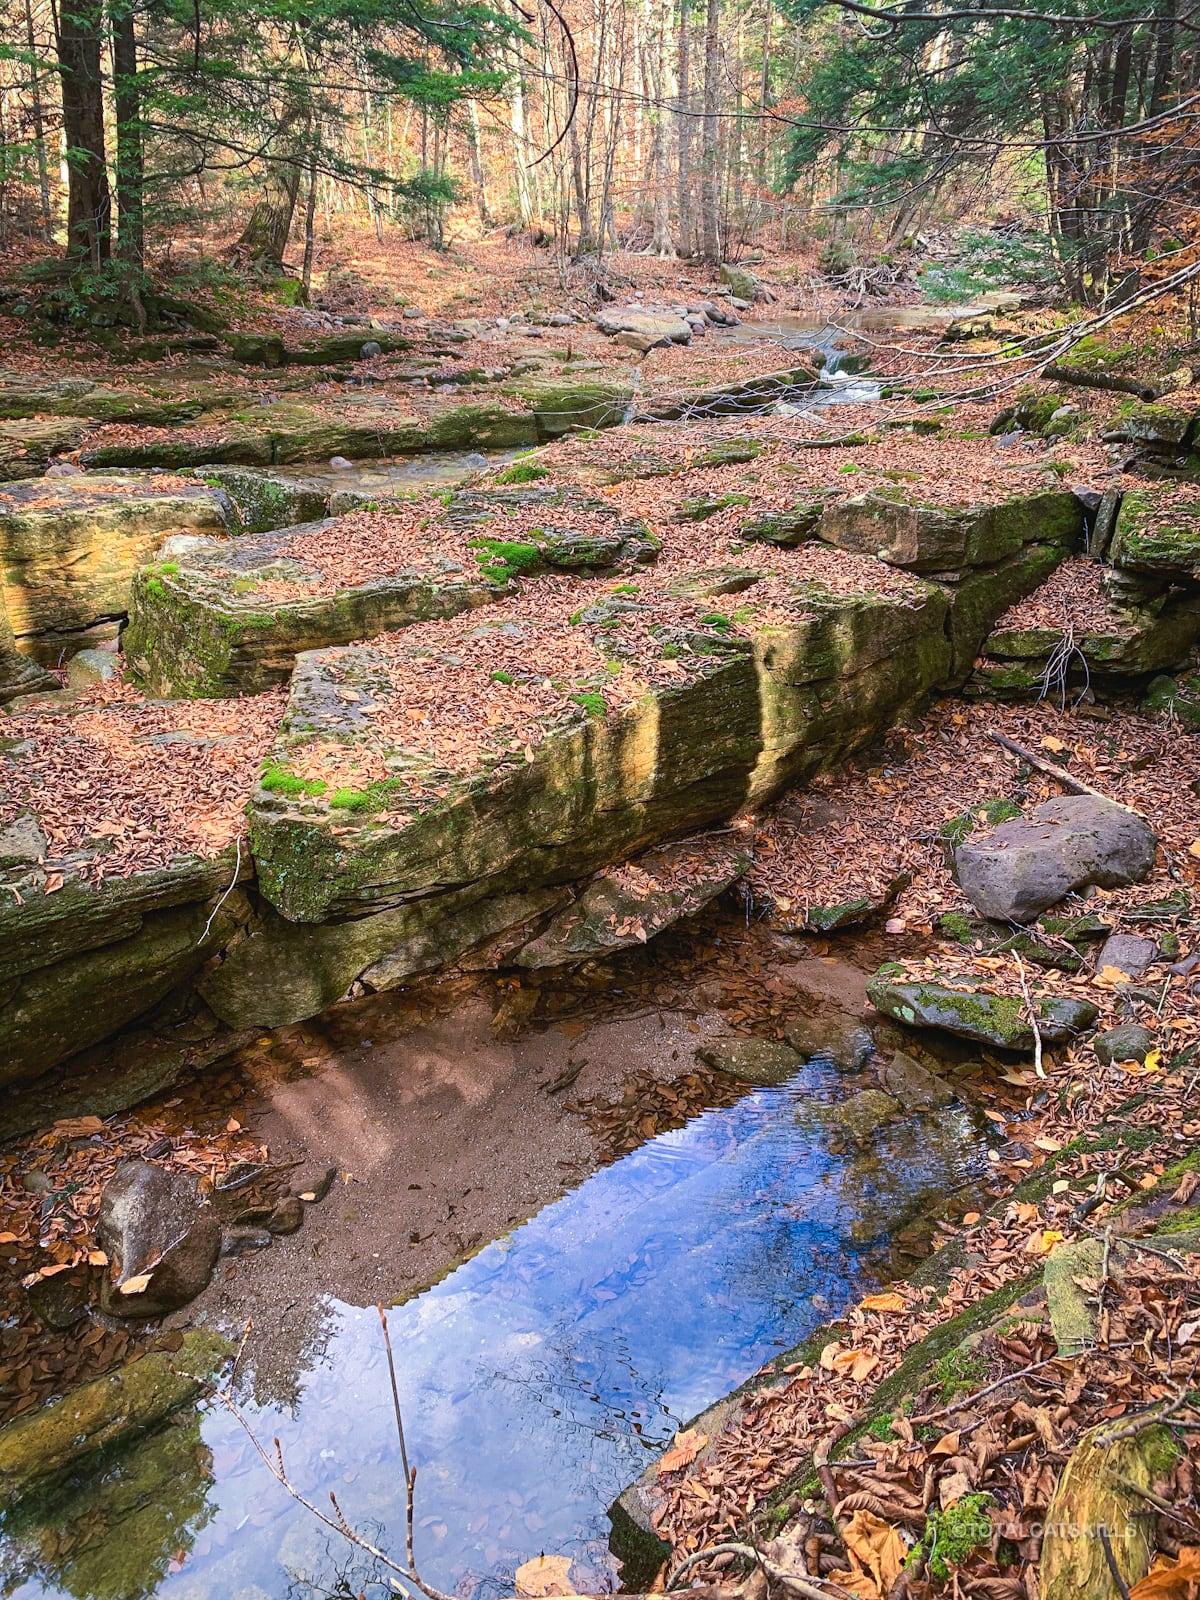 fisherman's path boulders in stream